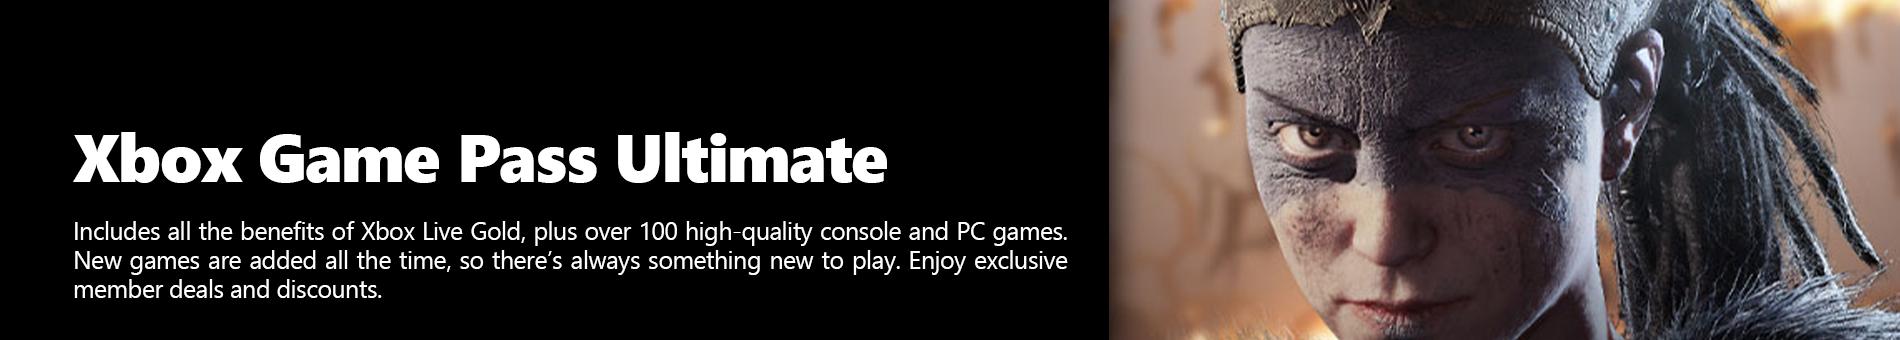 Xboxdigital Ultimate